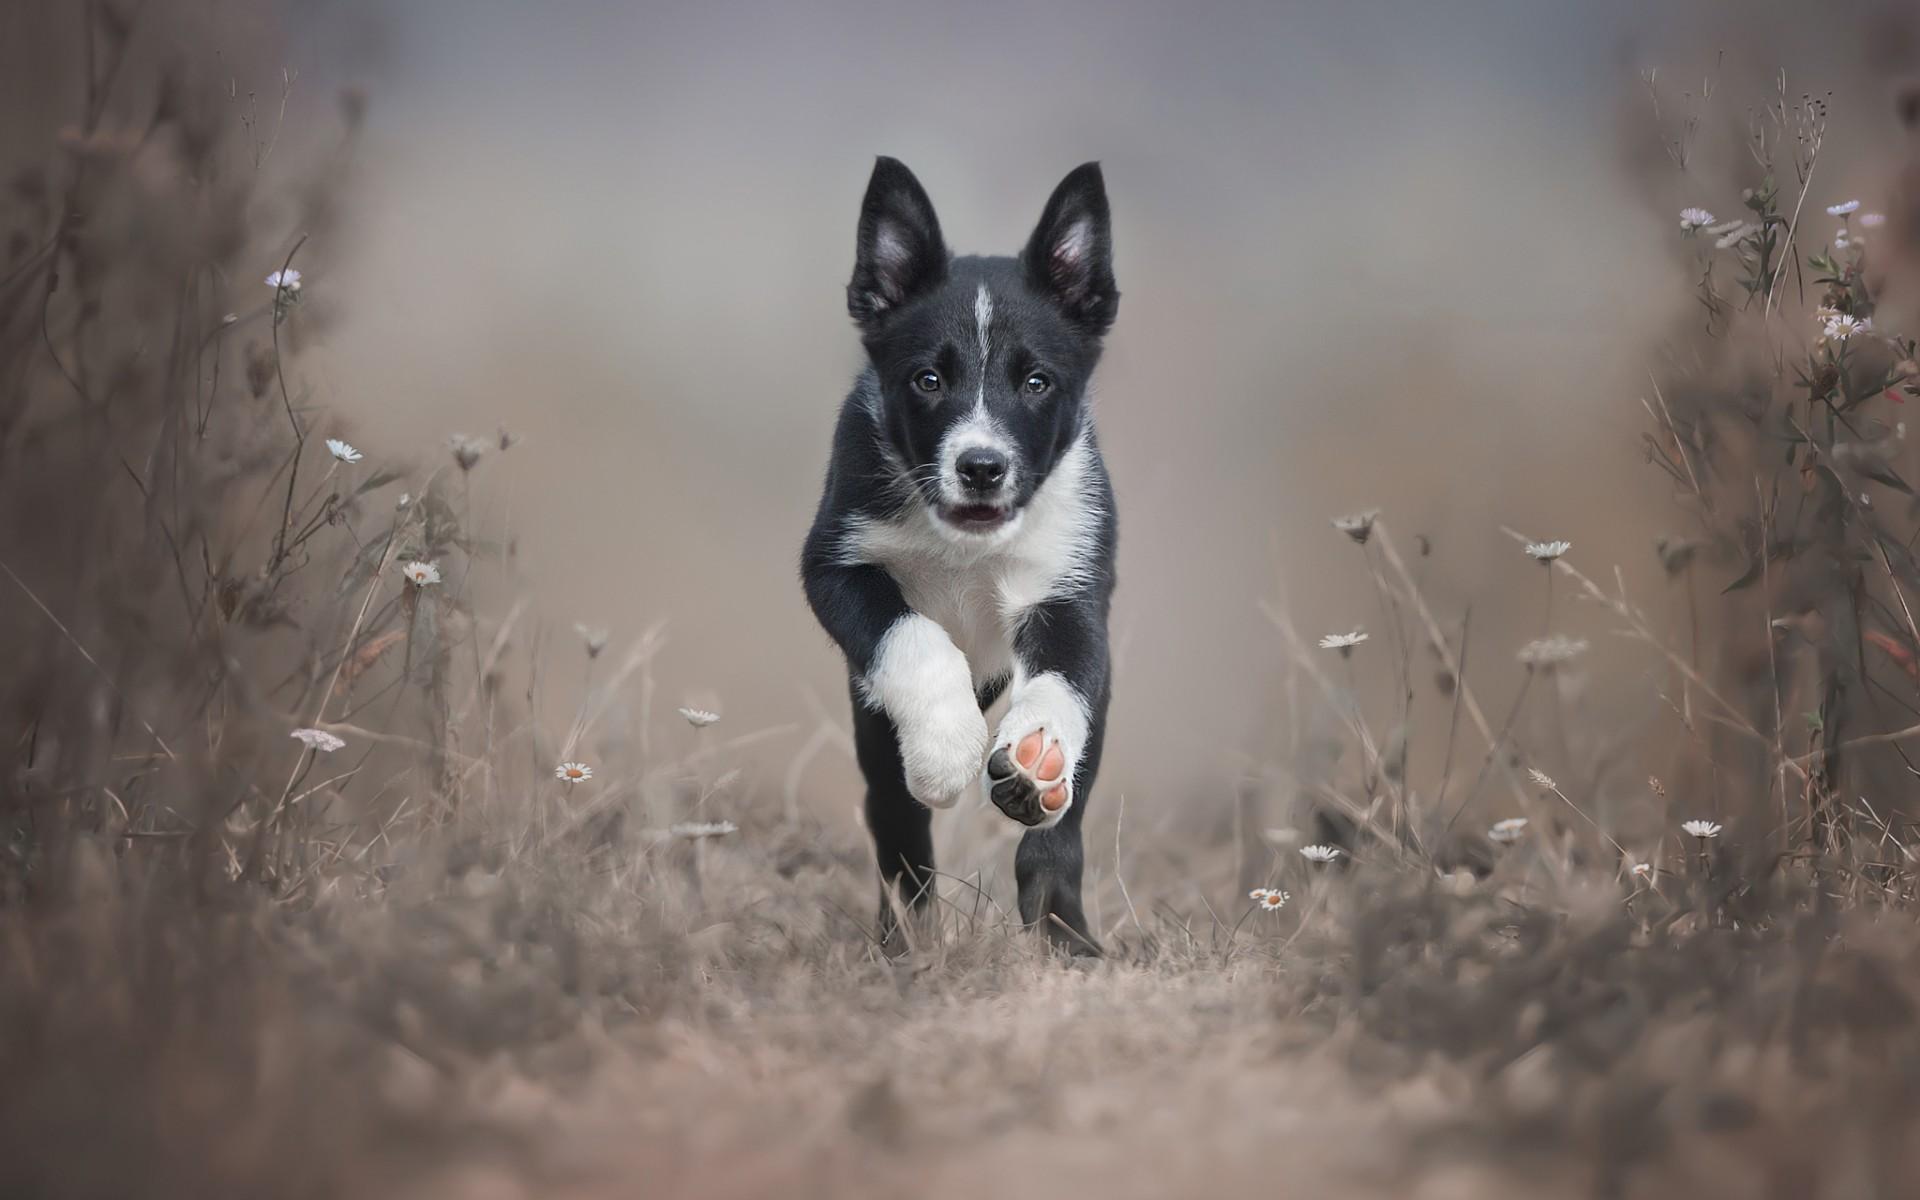 download wallpaper: Border Collie puppie komt aanrennen wallpaper